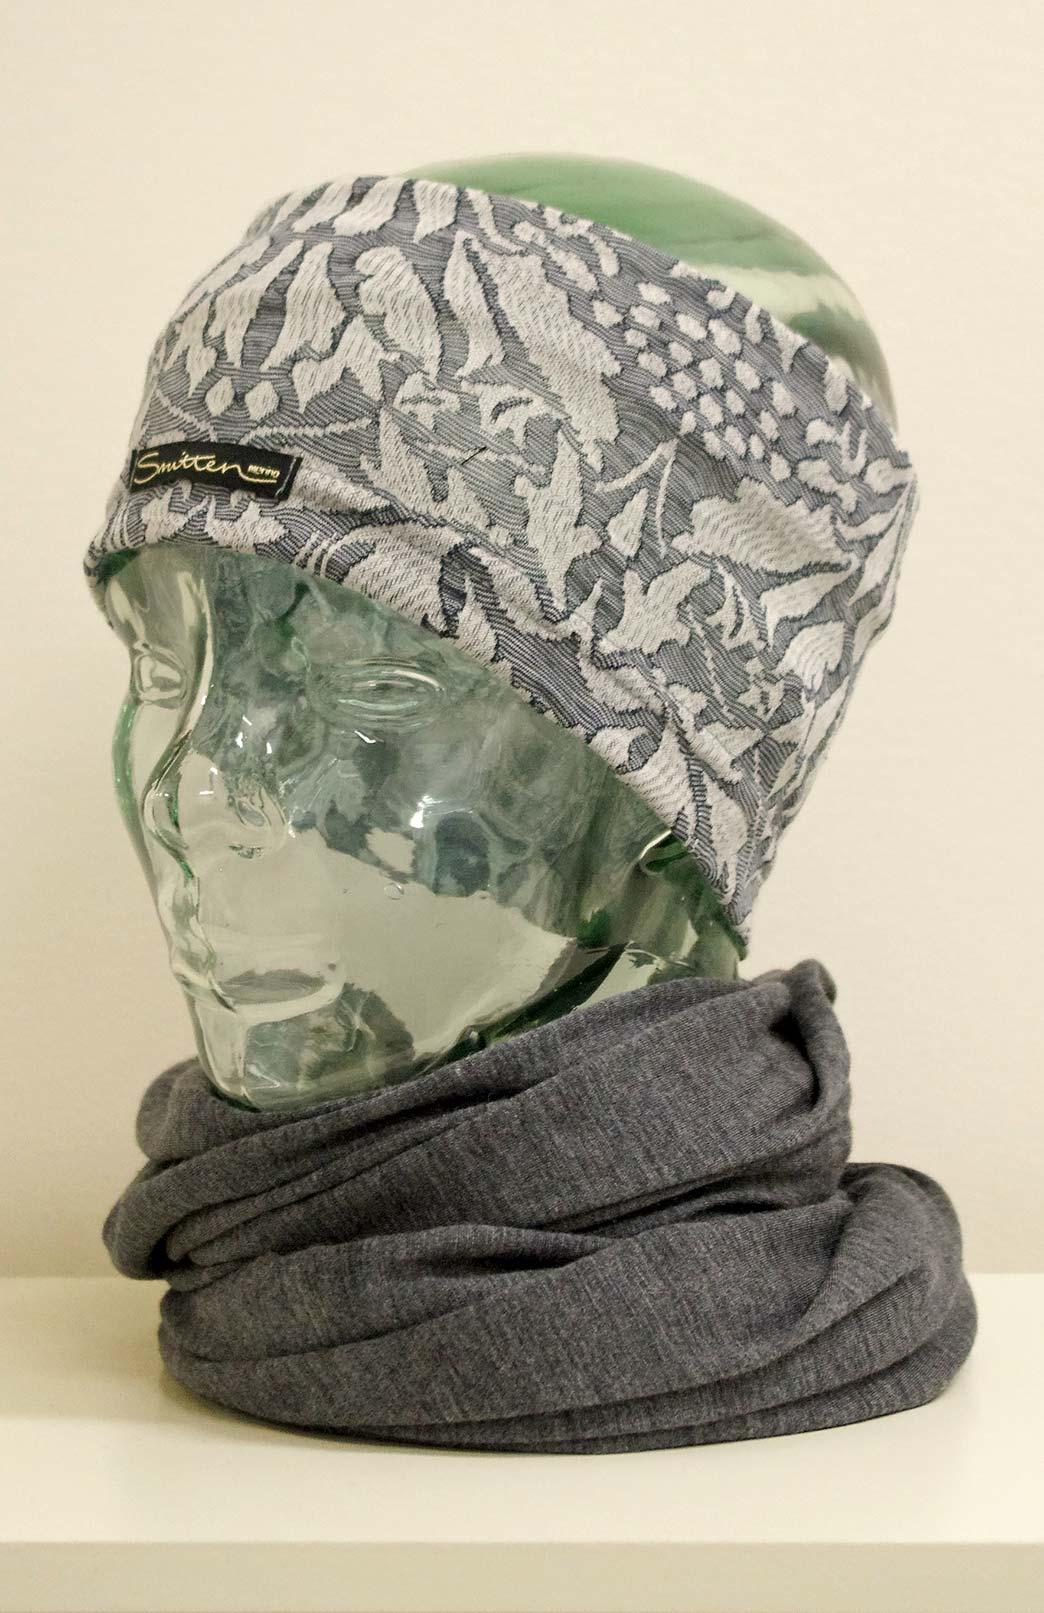 Headband / Ear Warmer - Unisex Blue Grey Abbey Floral Merino Wool Headband and Ear Warmer - Smitten Merino Tasmania Australia